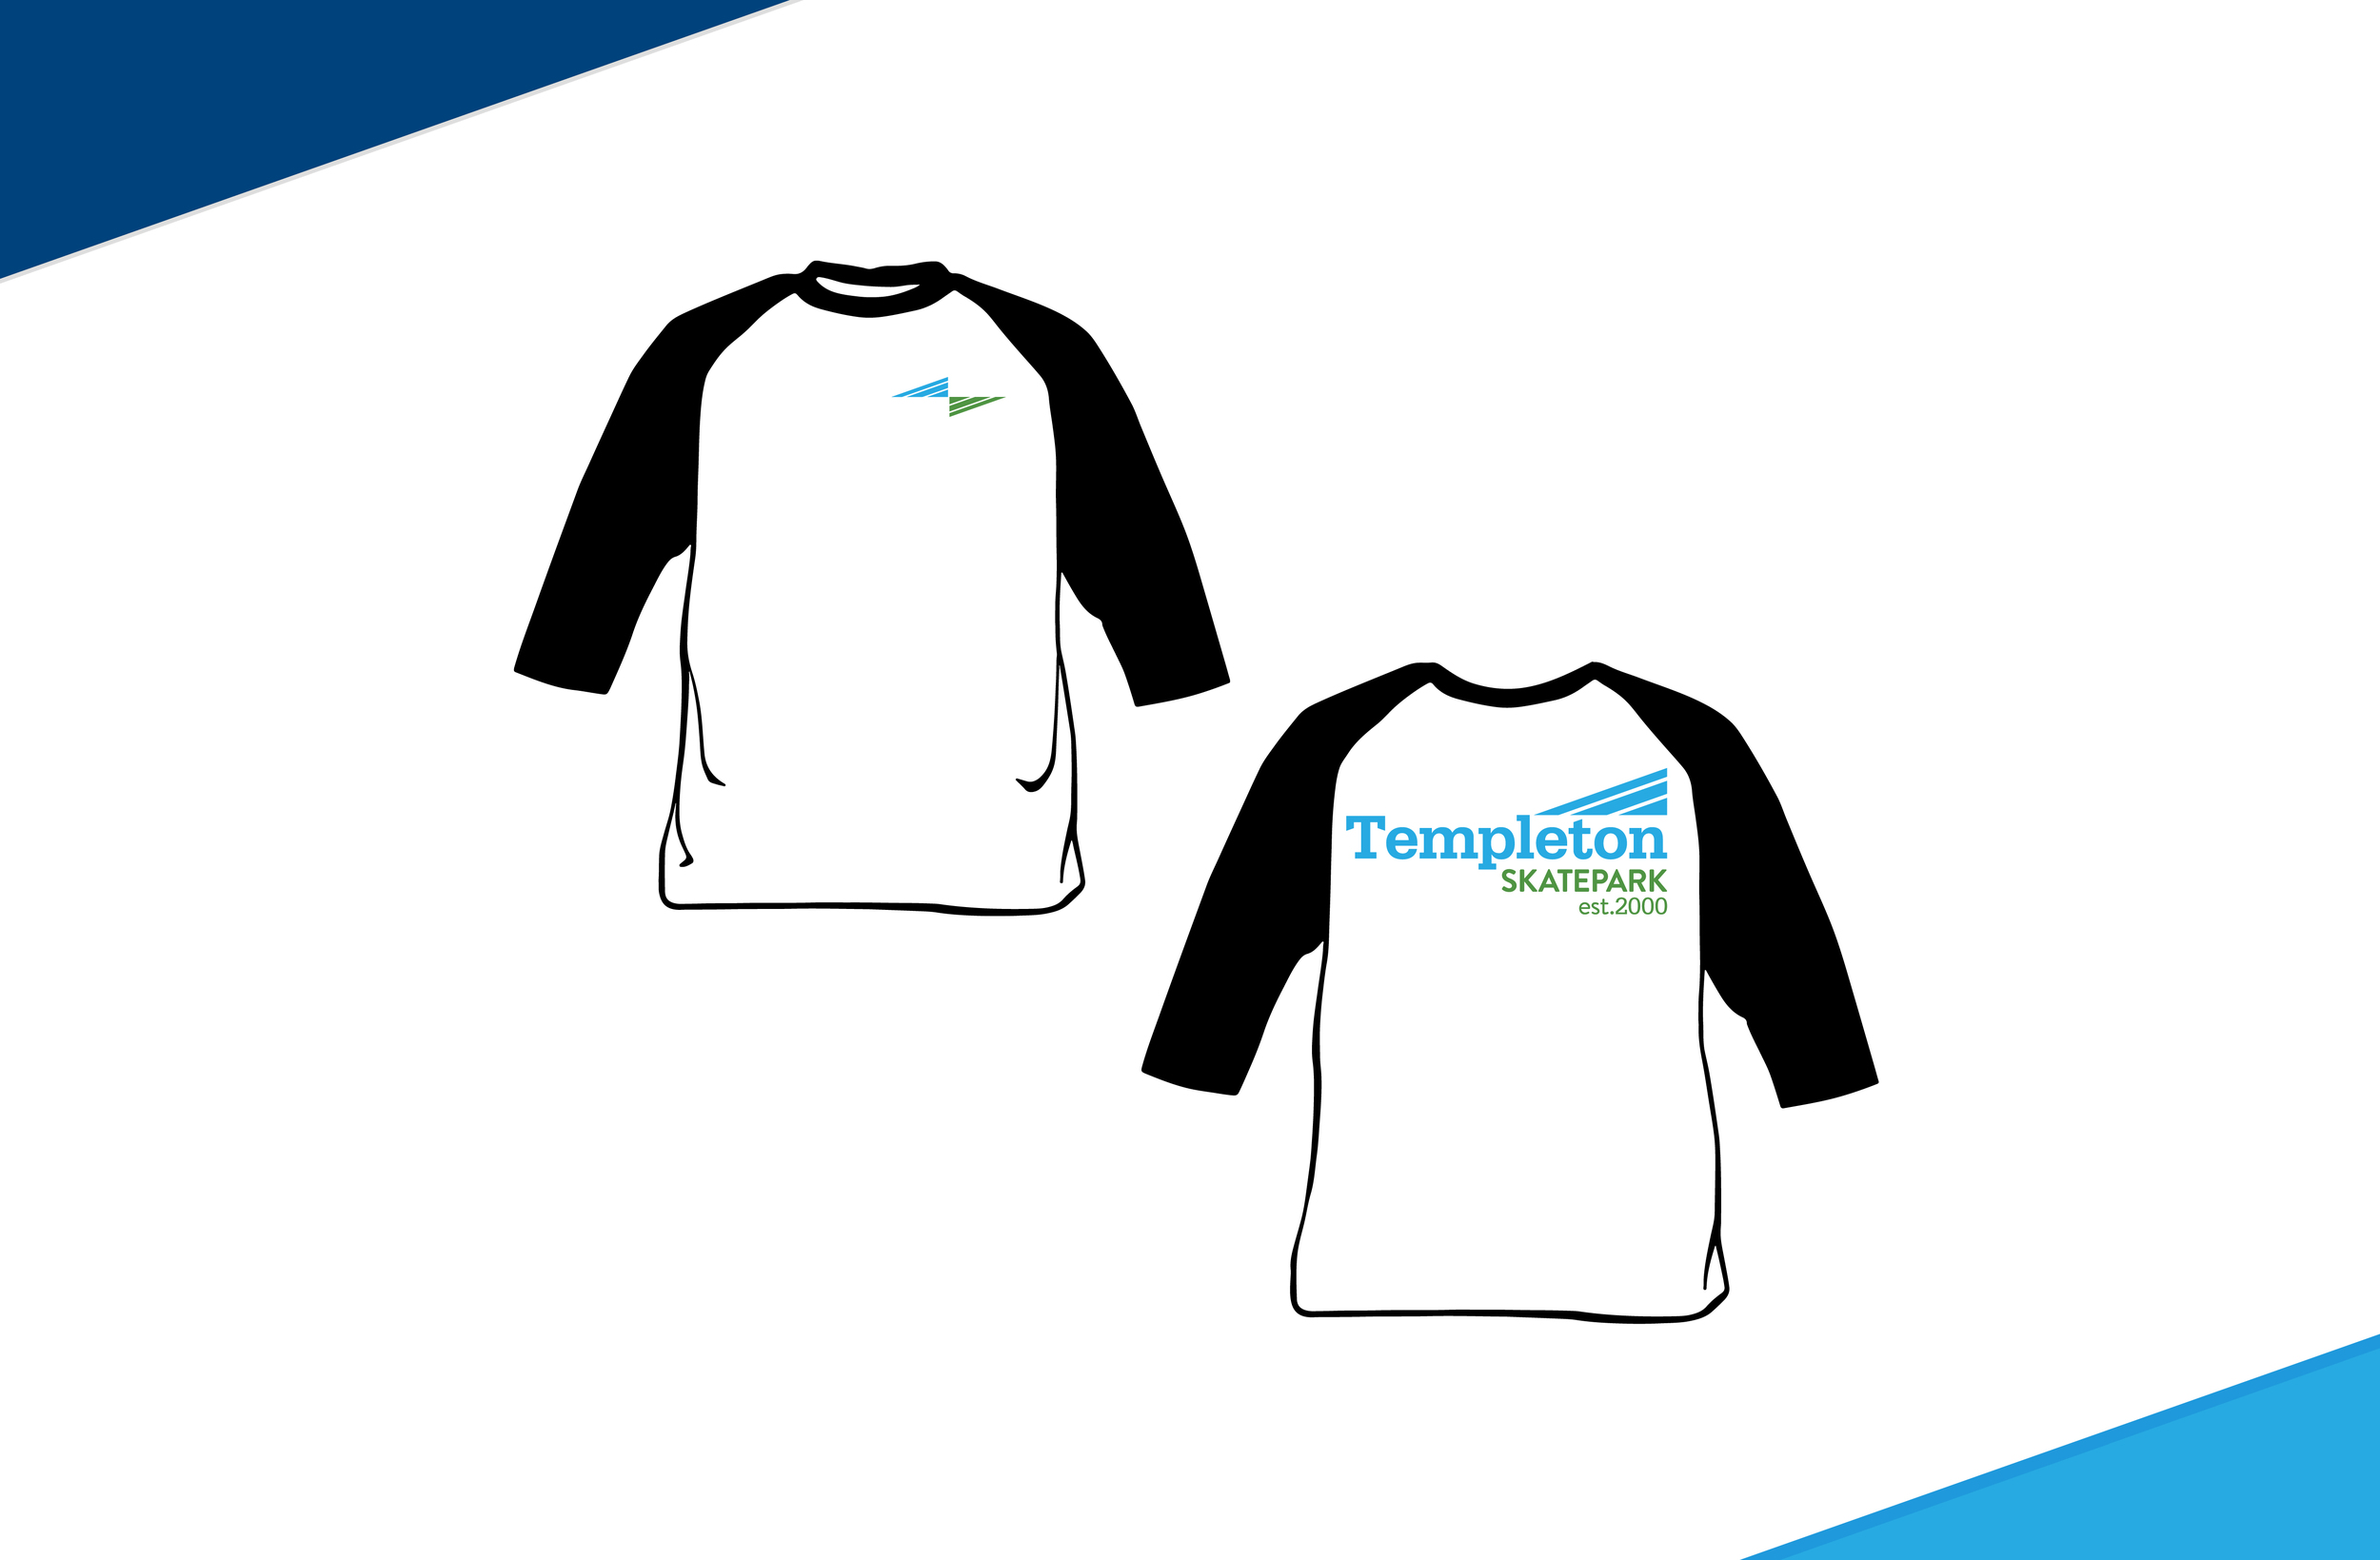 Templeton skatepark apparel web2.jpg